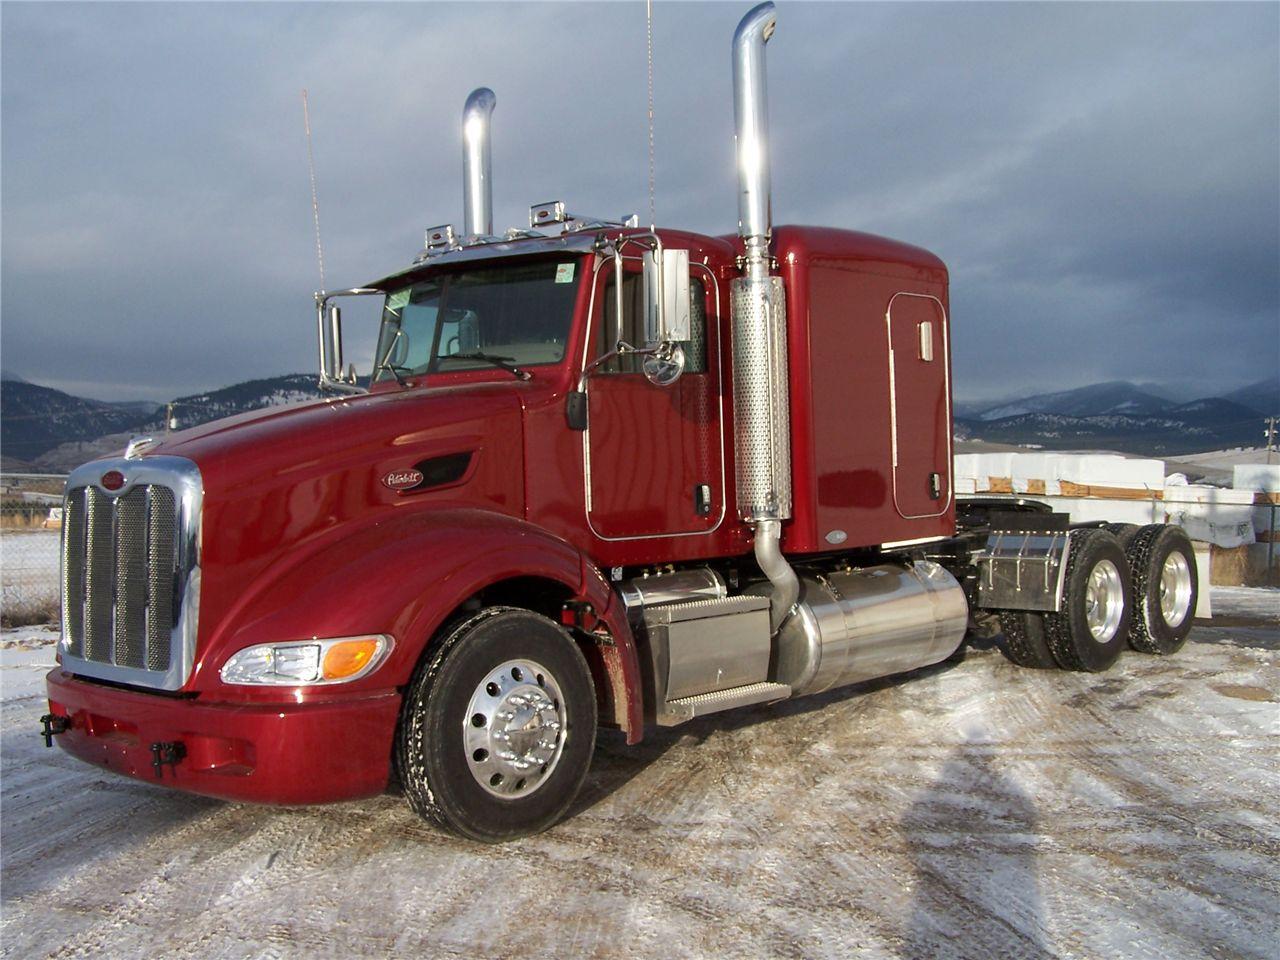 http://3.bp.blogspot.com/-0HBxEtsGga4/ToZkAu3tRdI/AAAAAAAADEE/3eDE6_AsQsQ/s1600/heavy-duty-trucks.jpg